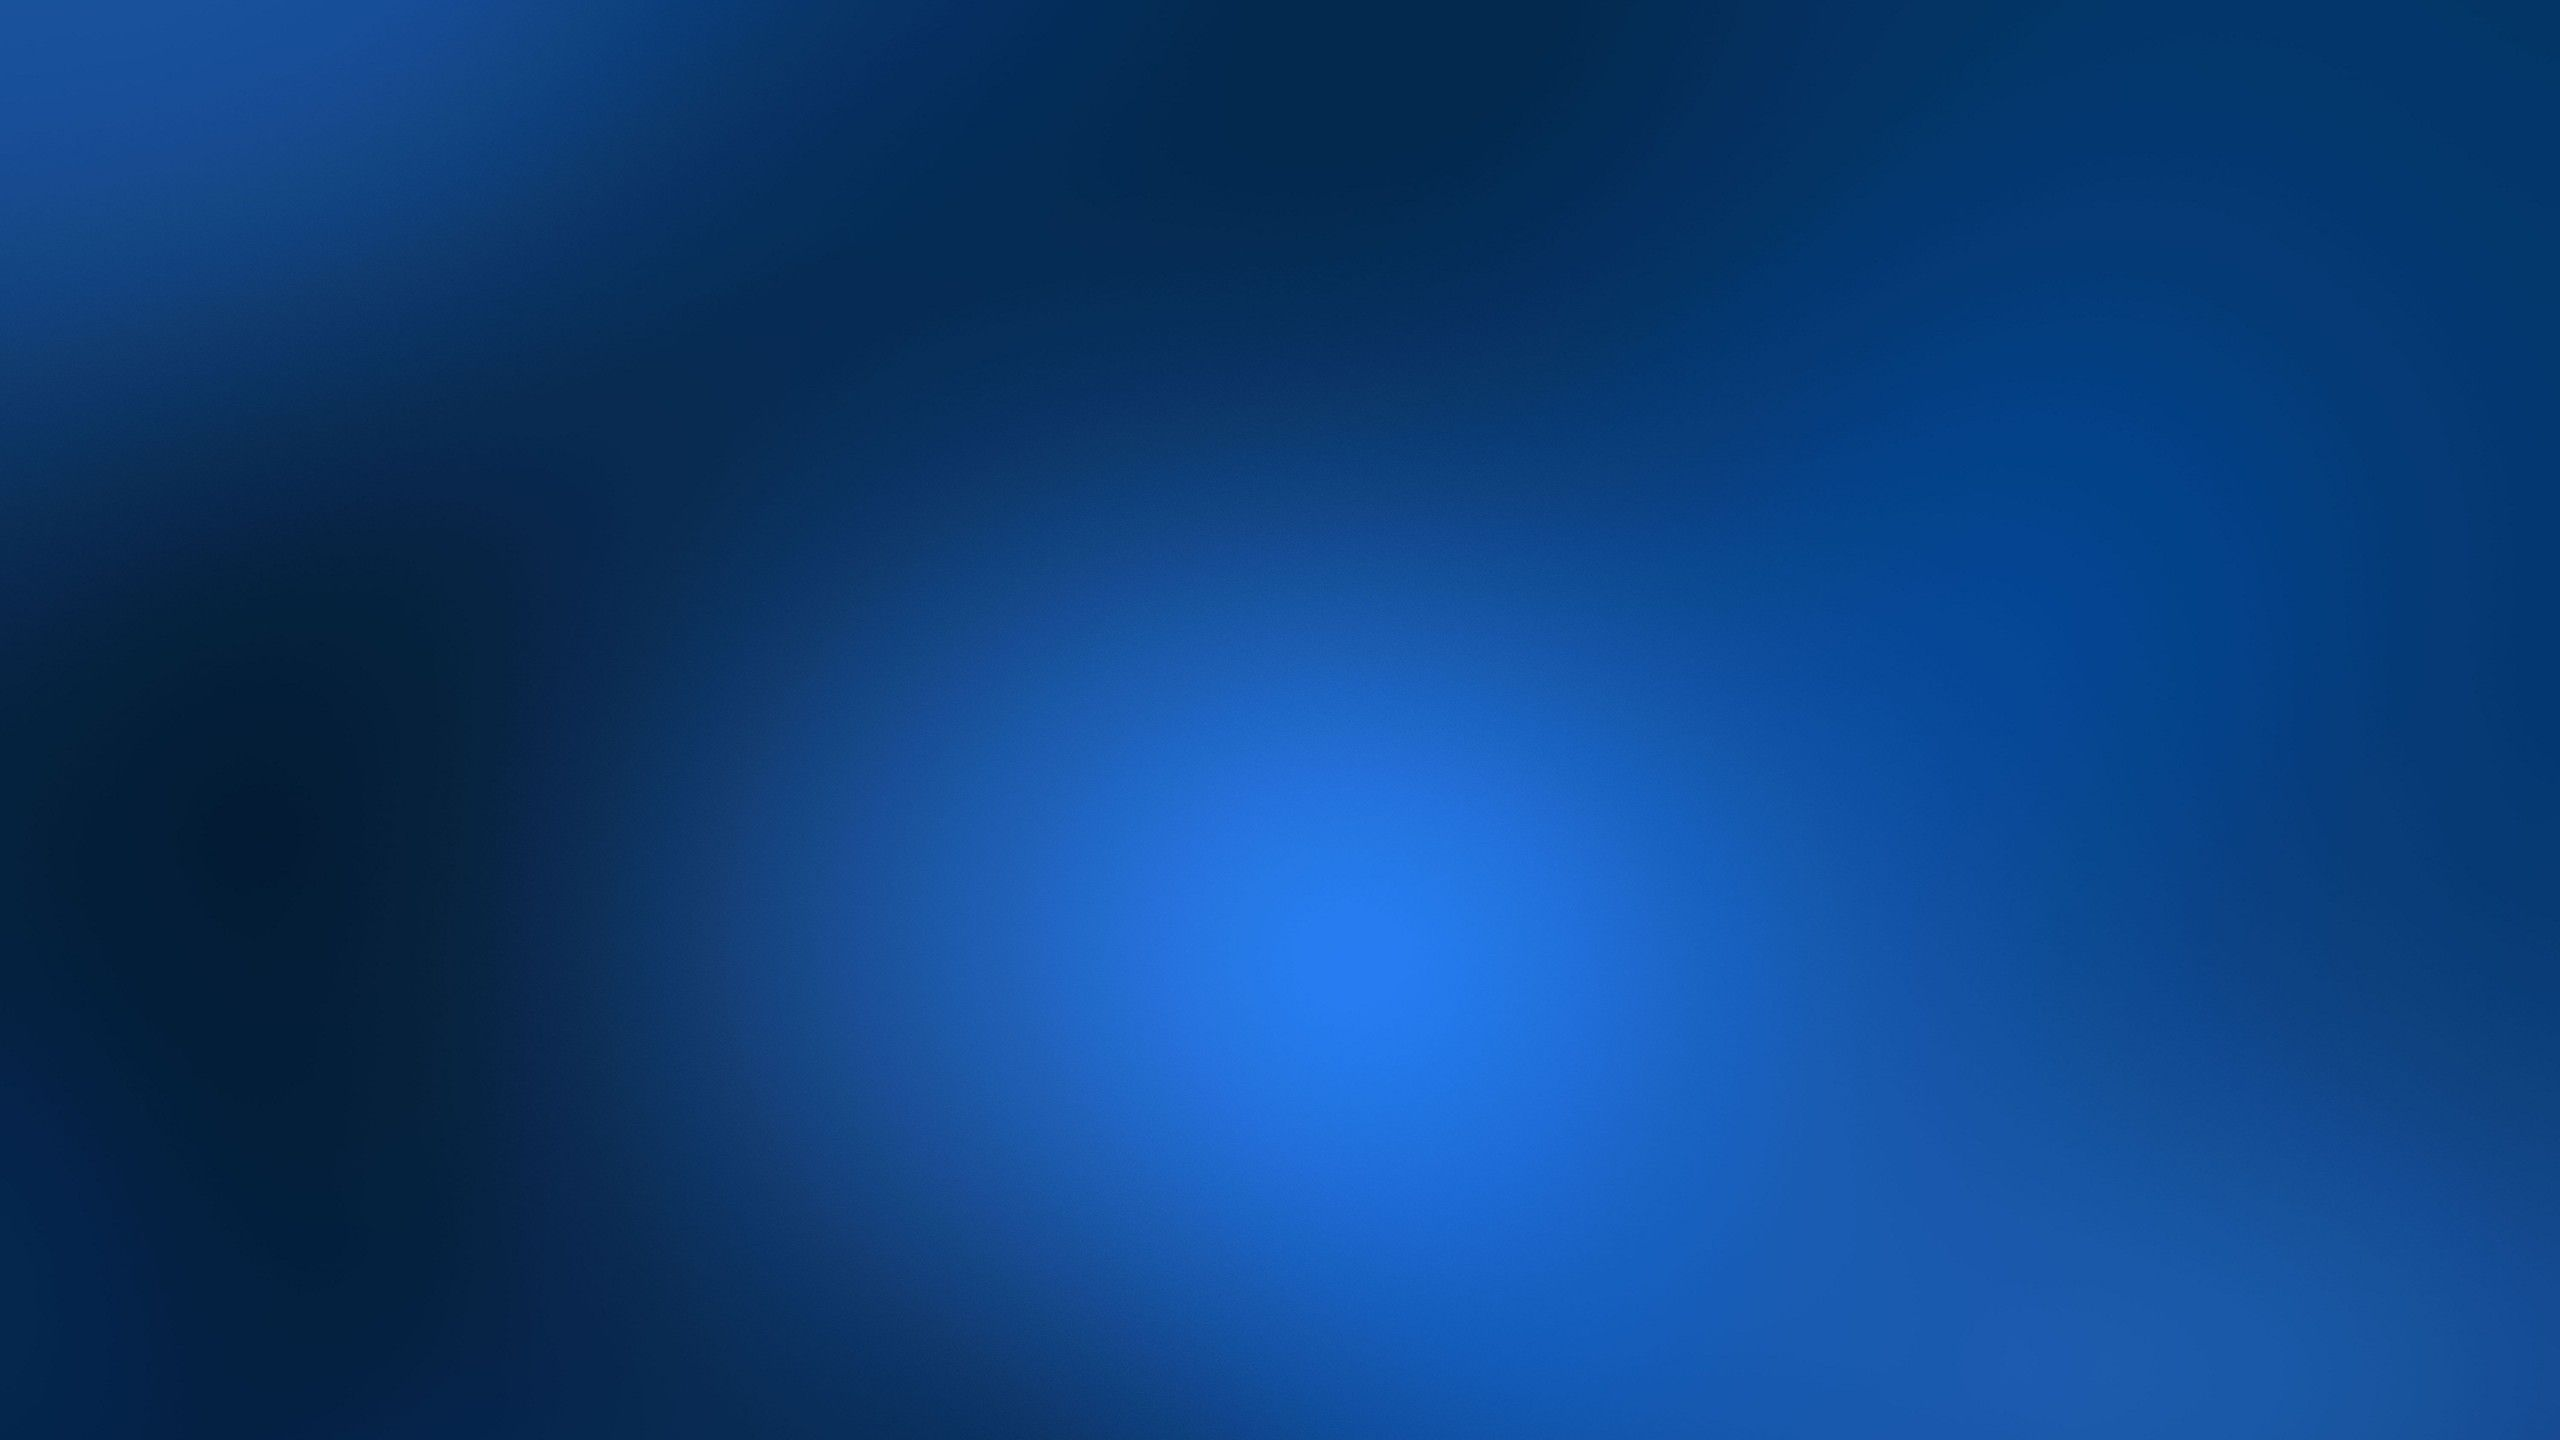 Plain Blue 4K Wallpapers - Top Free ...